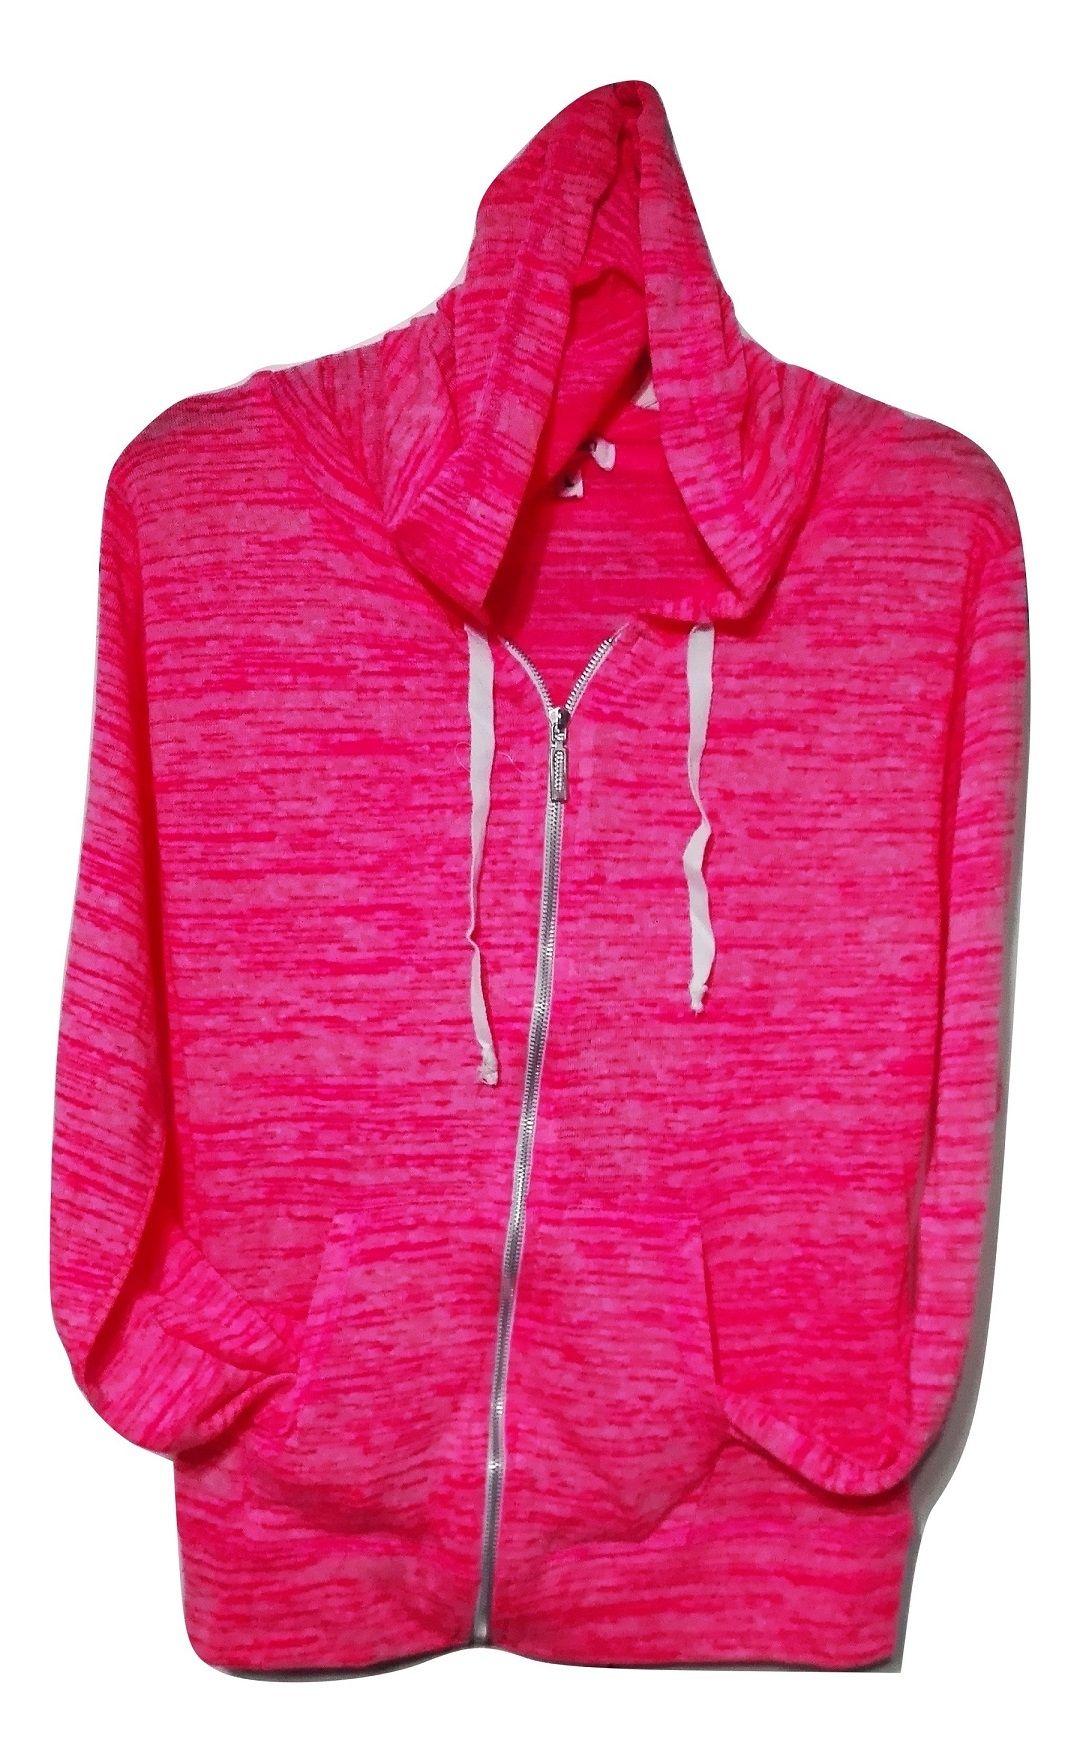 7cf1b2457145 Generic Winter Sweet Shirt For Women - Heather Pink